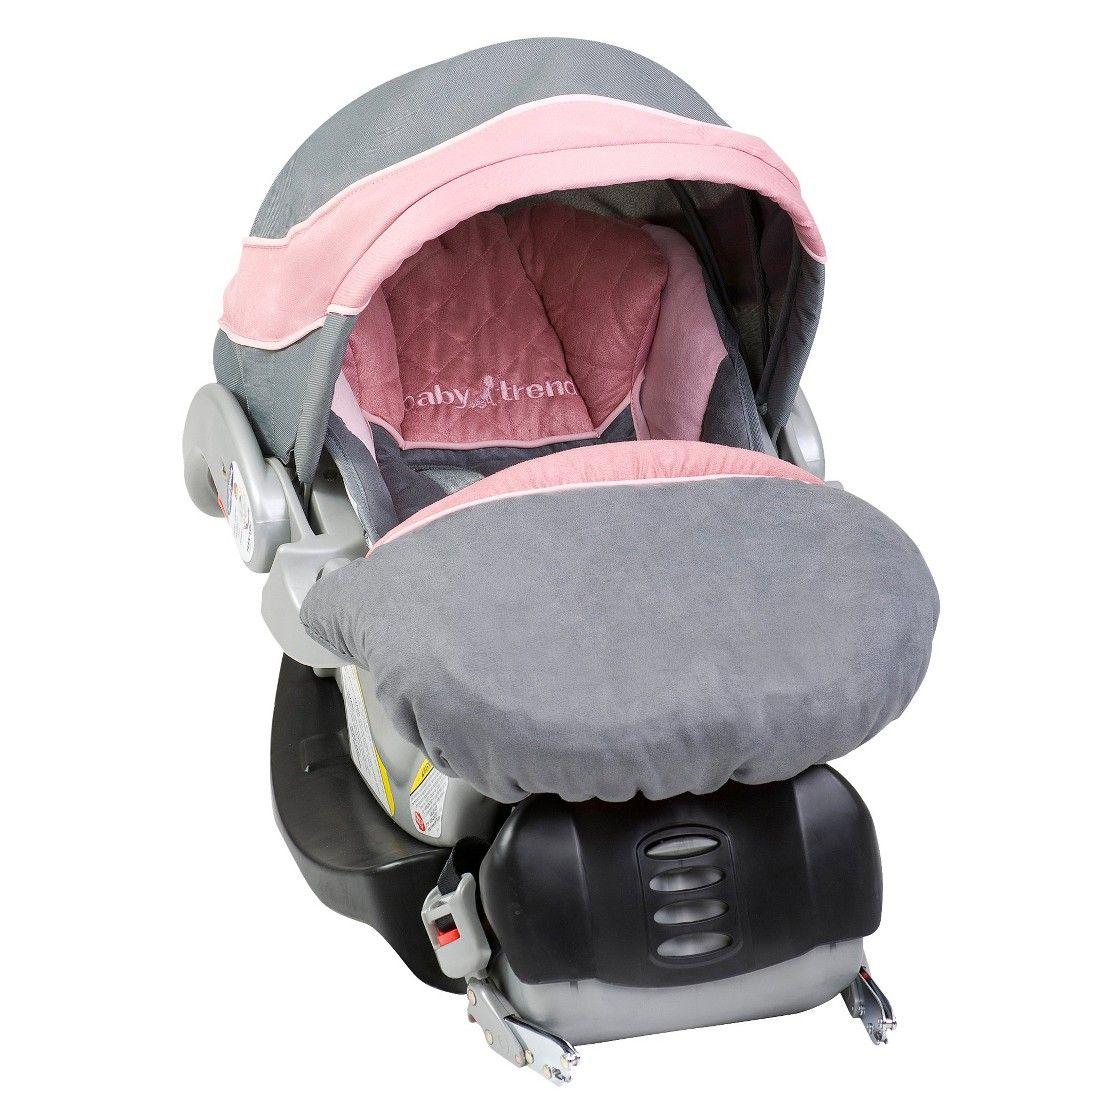 Baby Trend FlexLoc 30 lb. Infant Car Seat Baby car